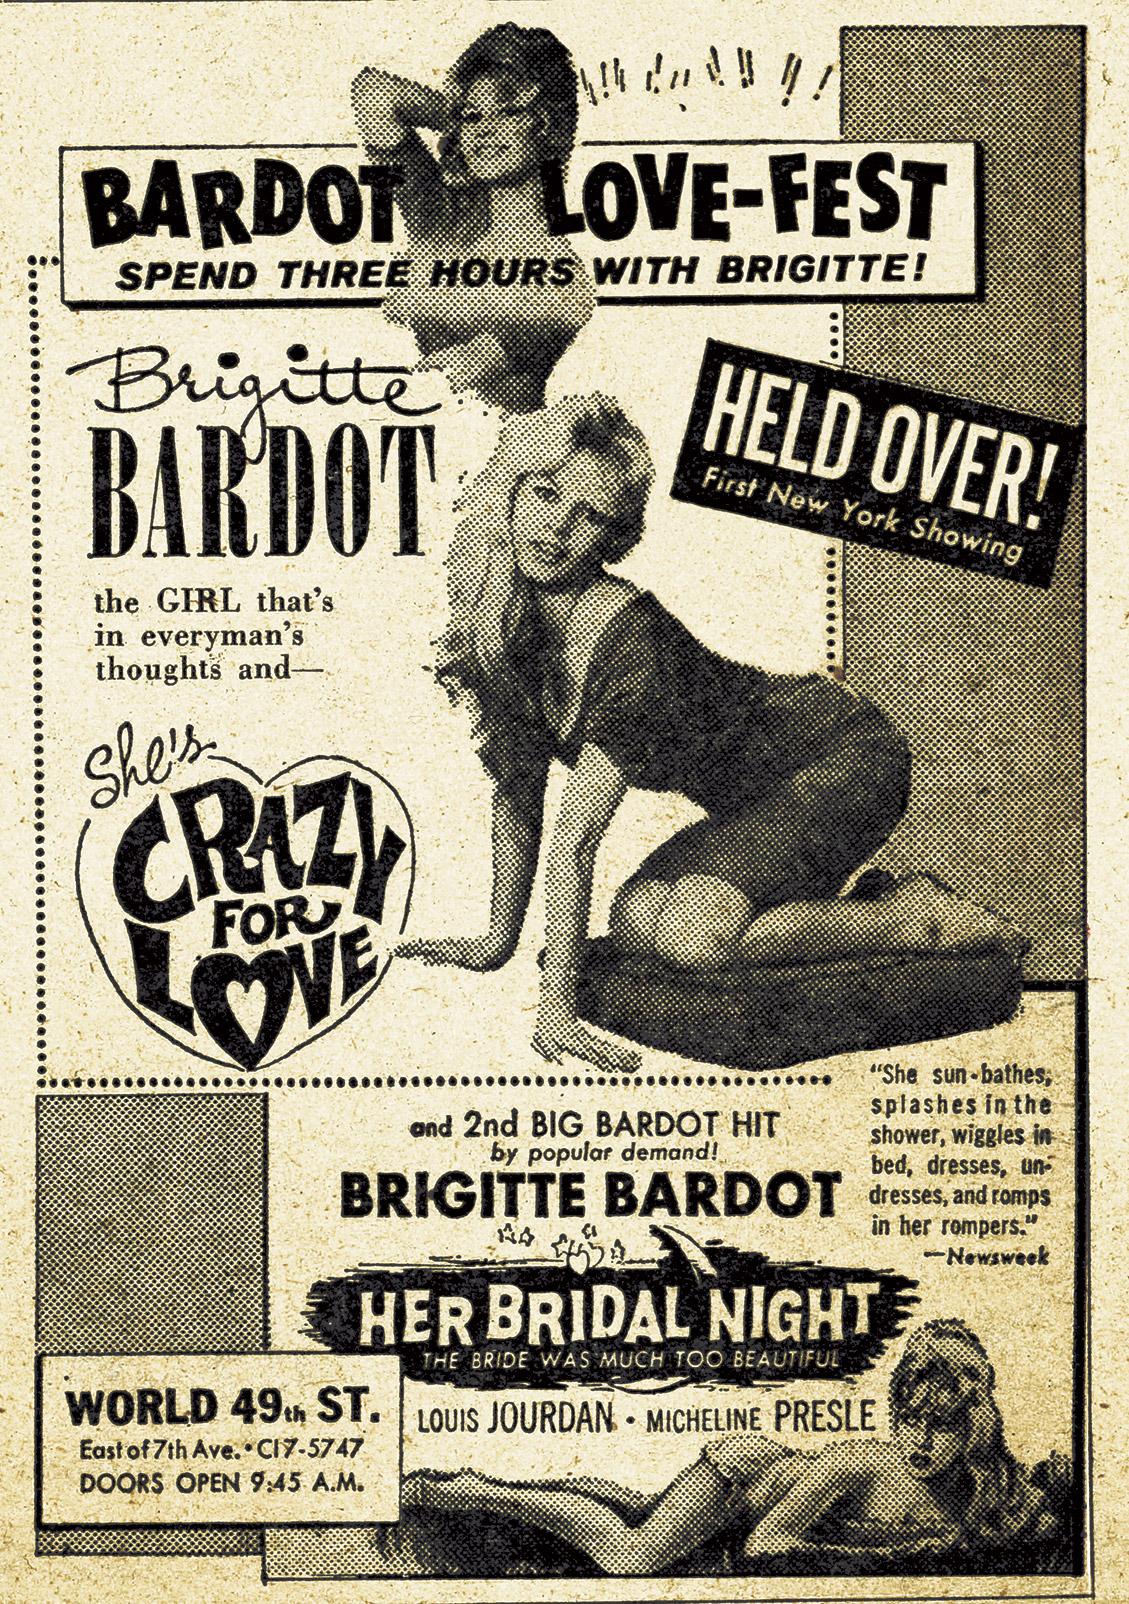 Bardot Love Fest newspaper advertisement, 1958.